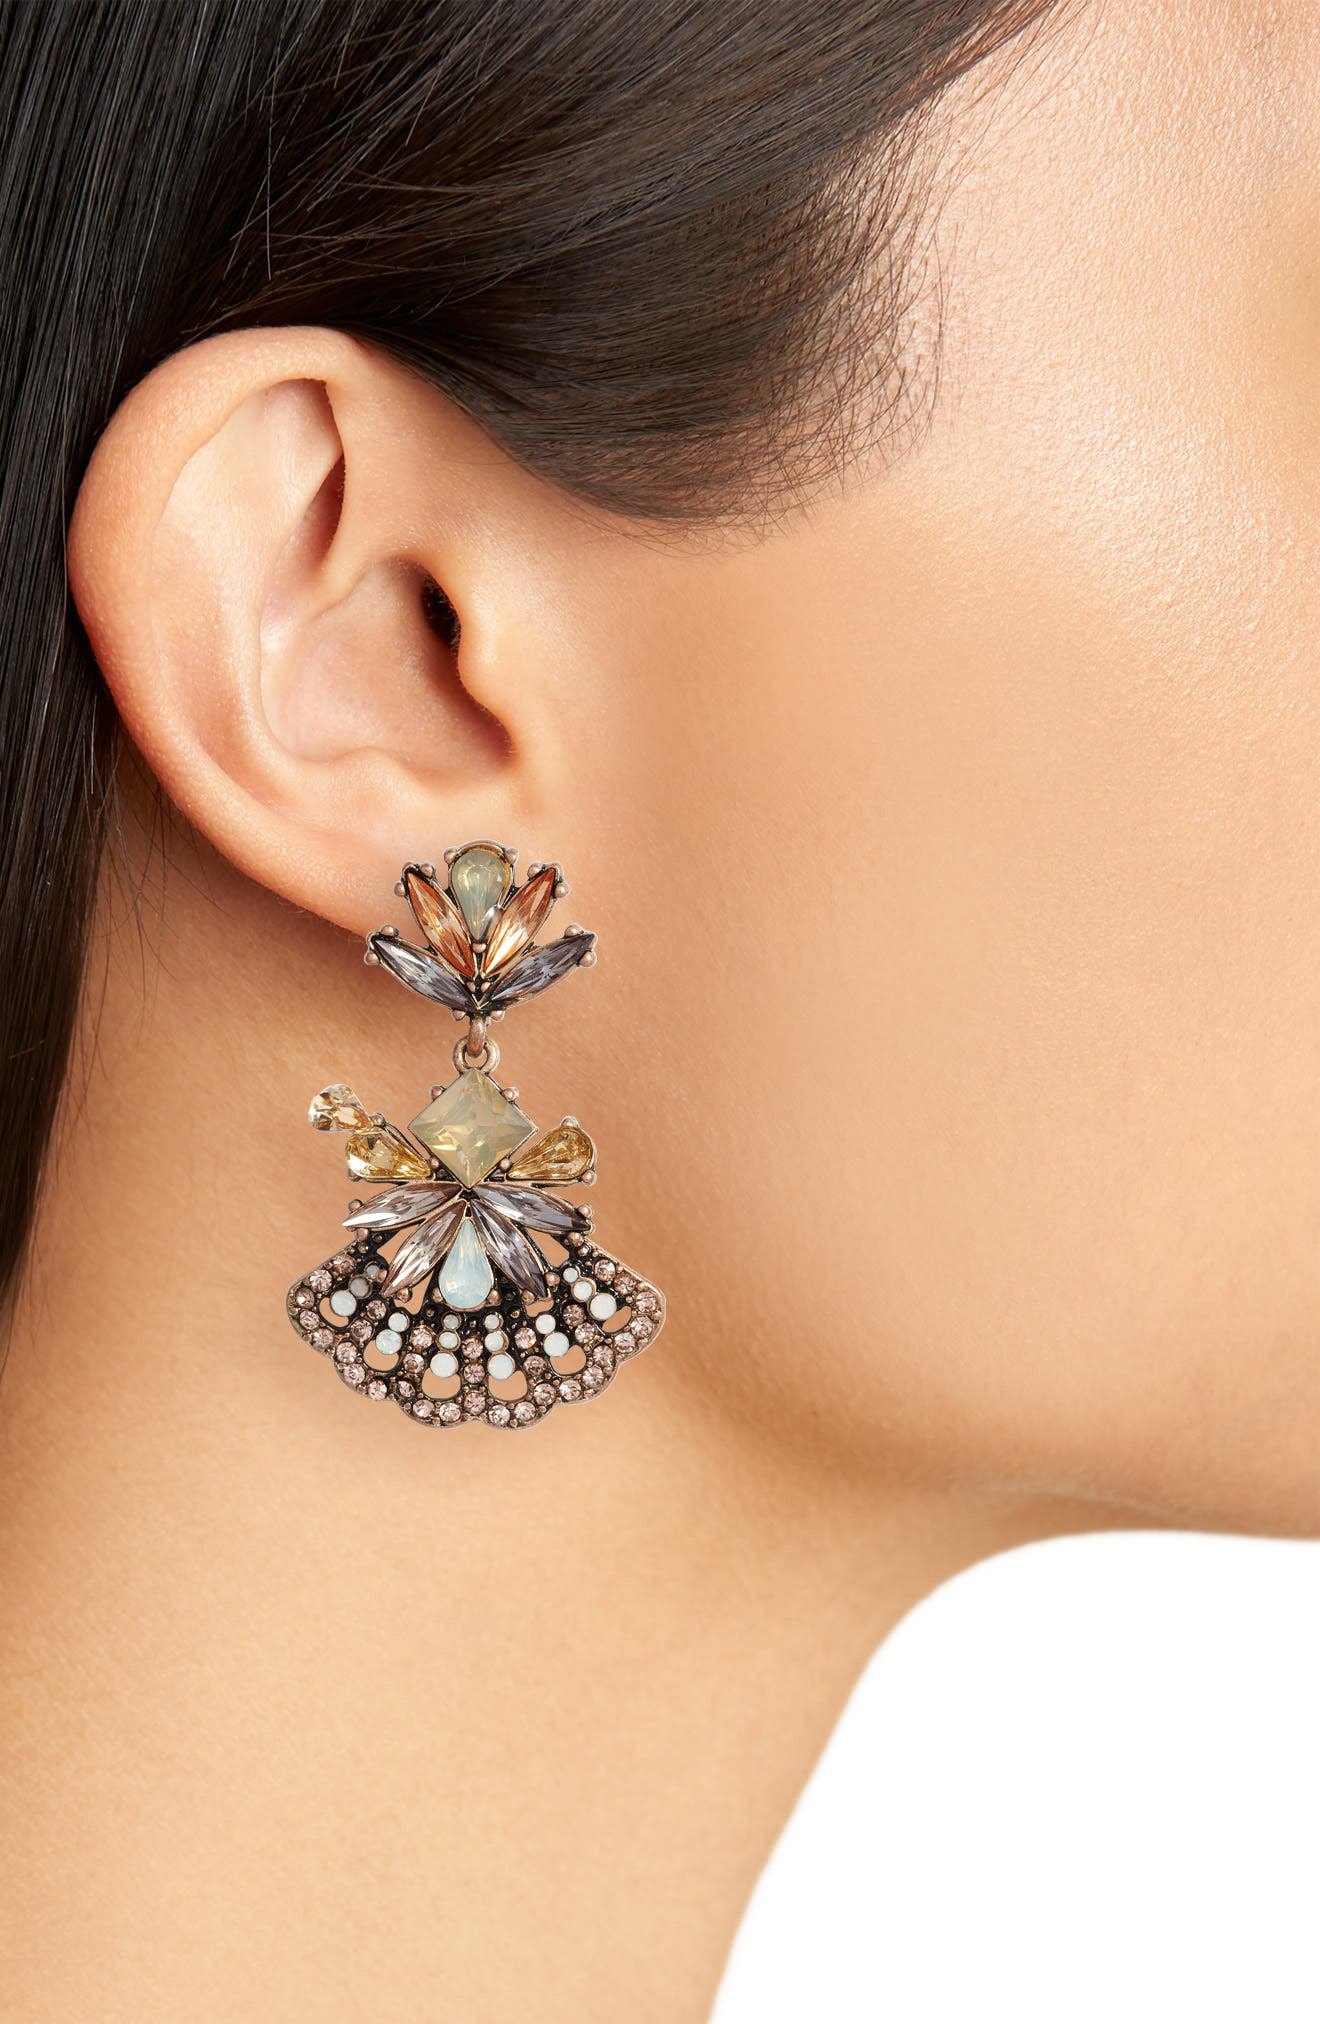 Crystal Fan Earrings,                             Alternate thumbnail 3, color,                             710